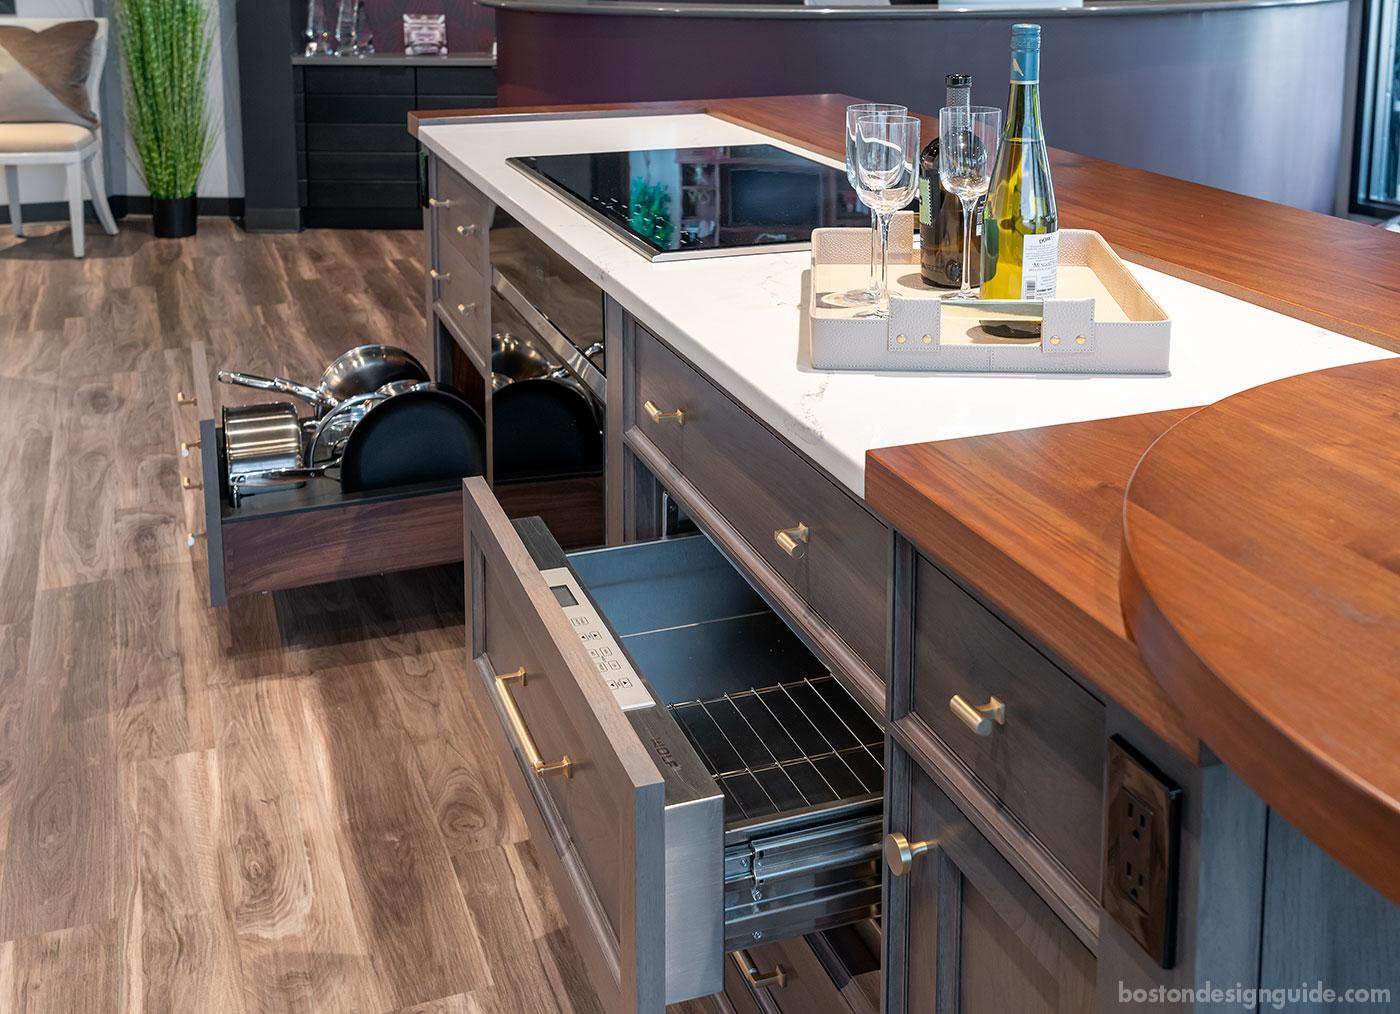 interiology Design Studio Co. custom kitchen island